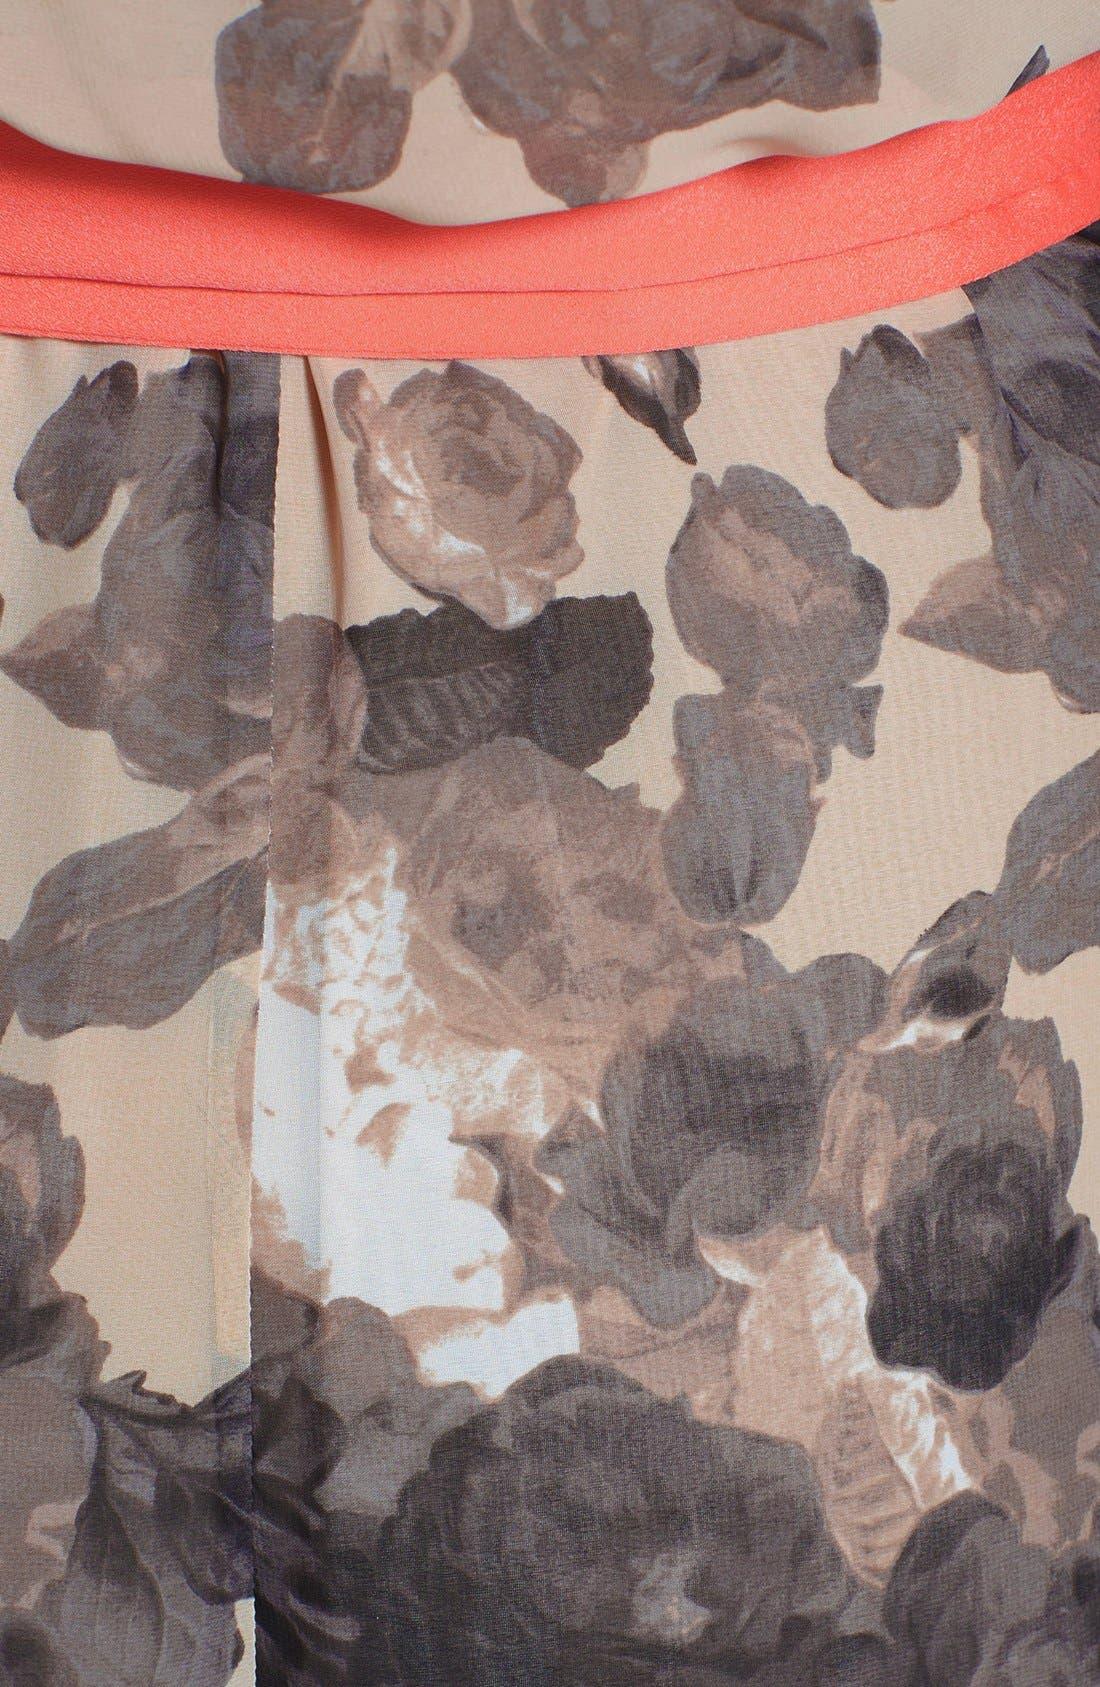 Floral Print Chiffon Maxi Dress,                             Alternate thumbnail 11, color,                             TAUPE/ BLACK